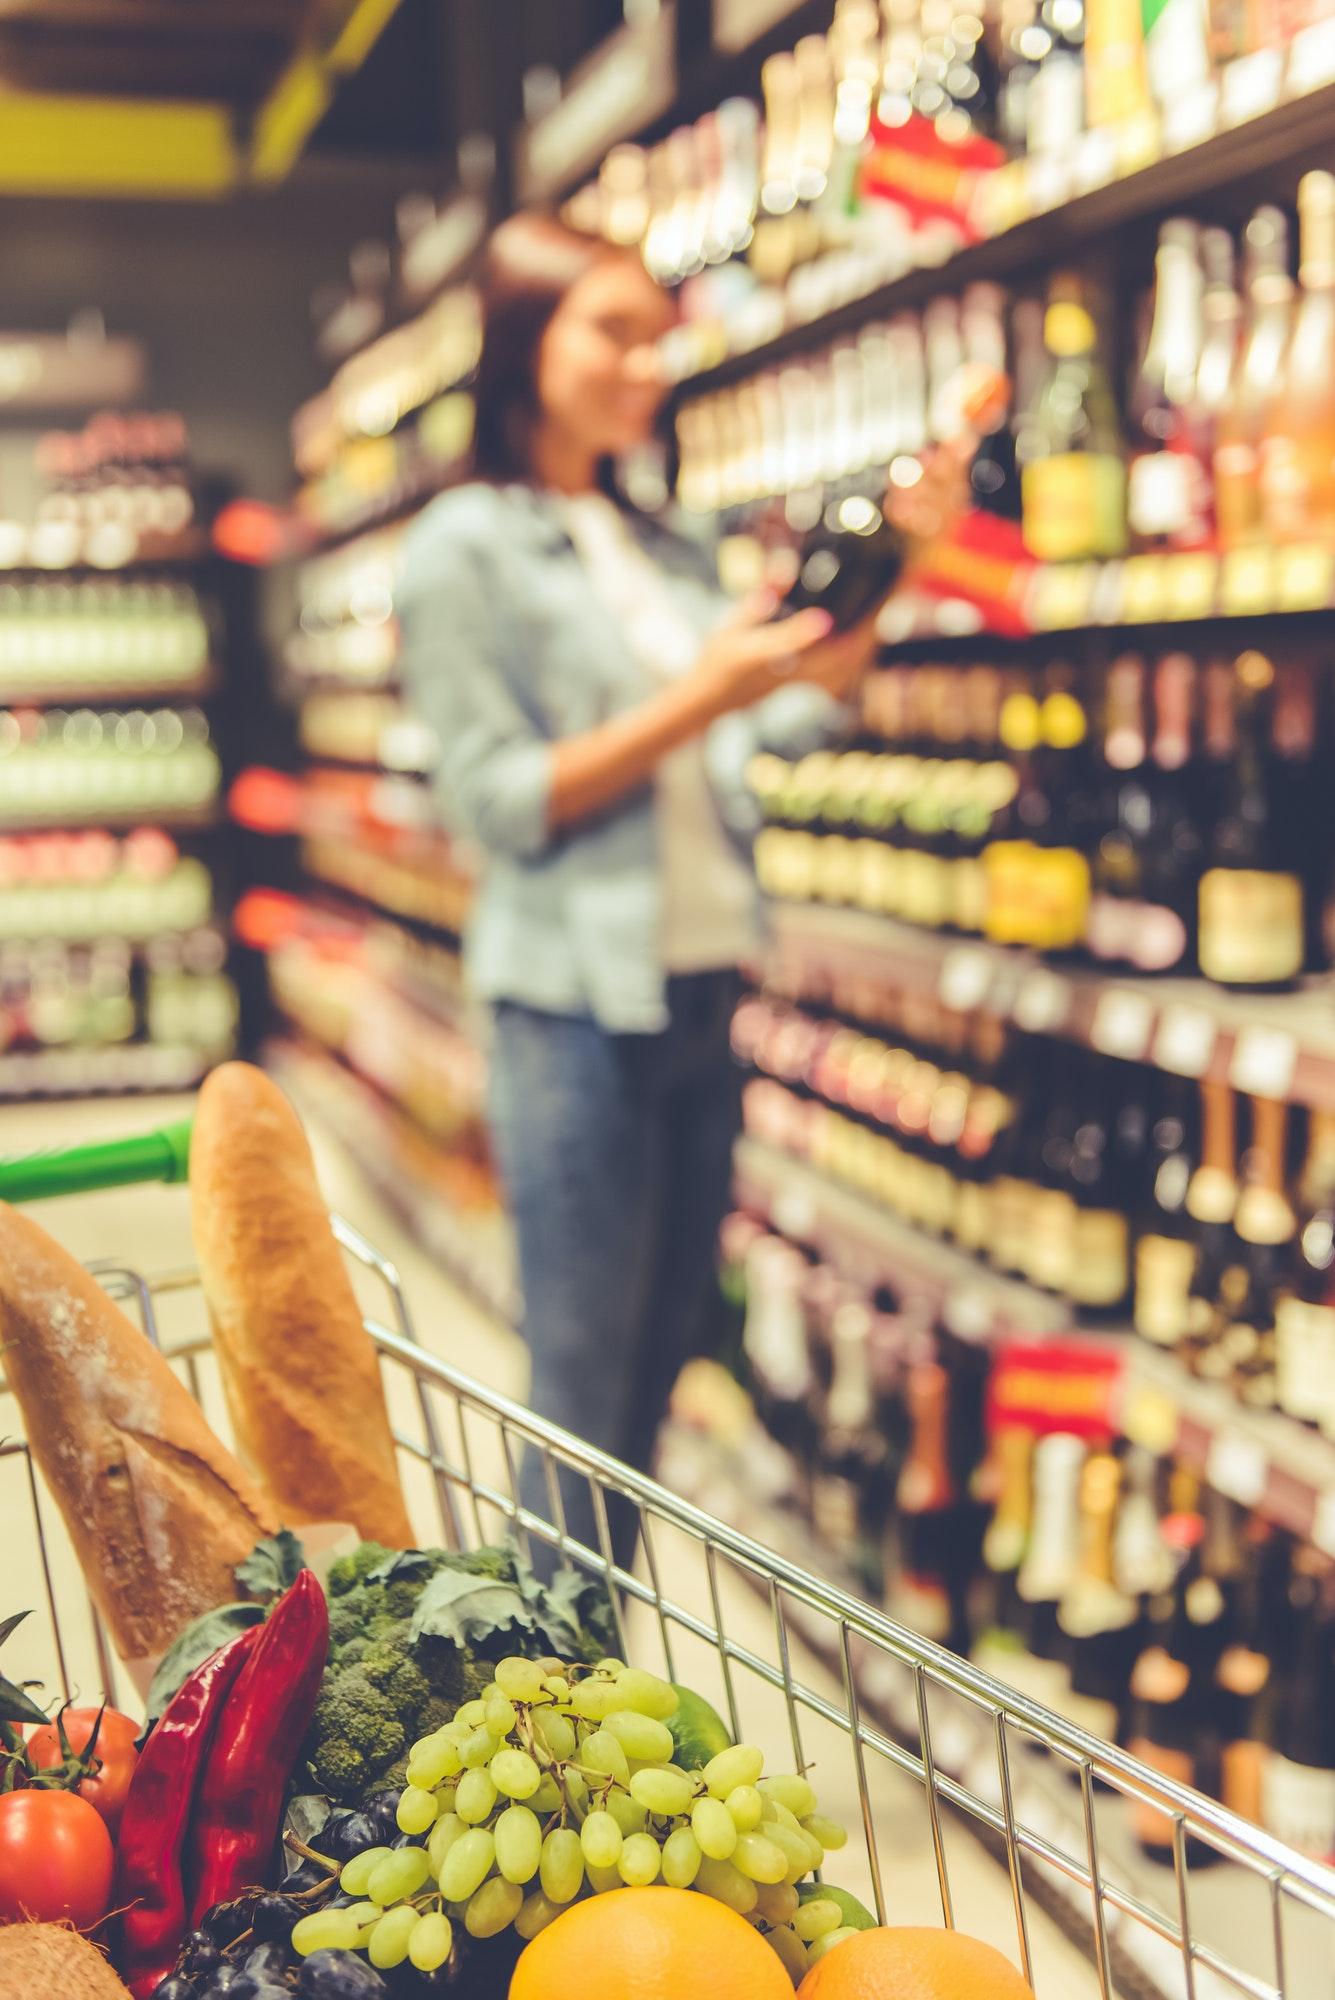 Girl in the supermarket